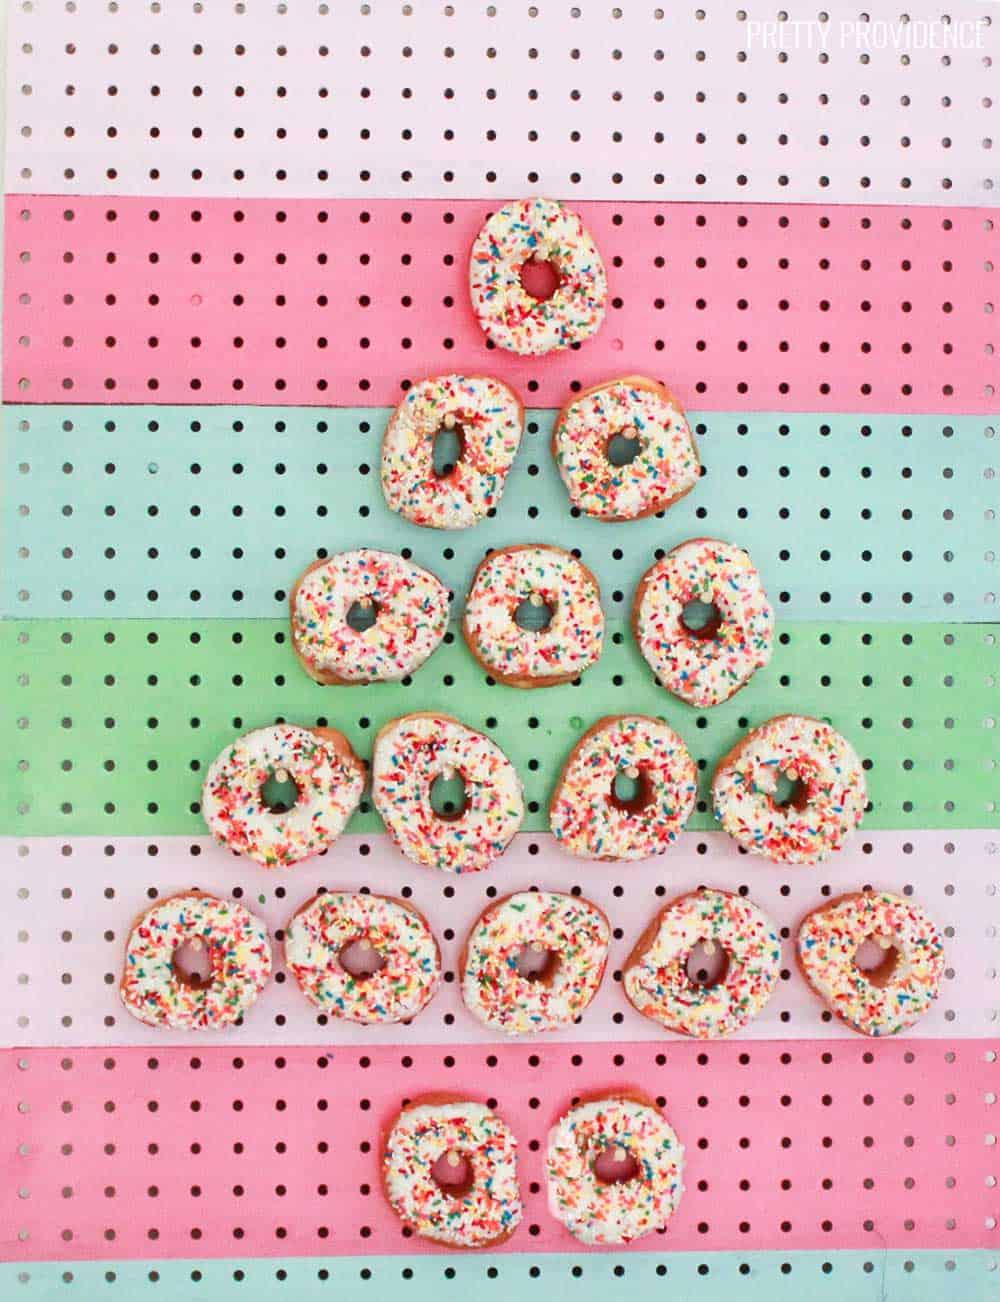 donuts-pegboard-1